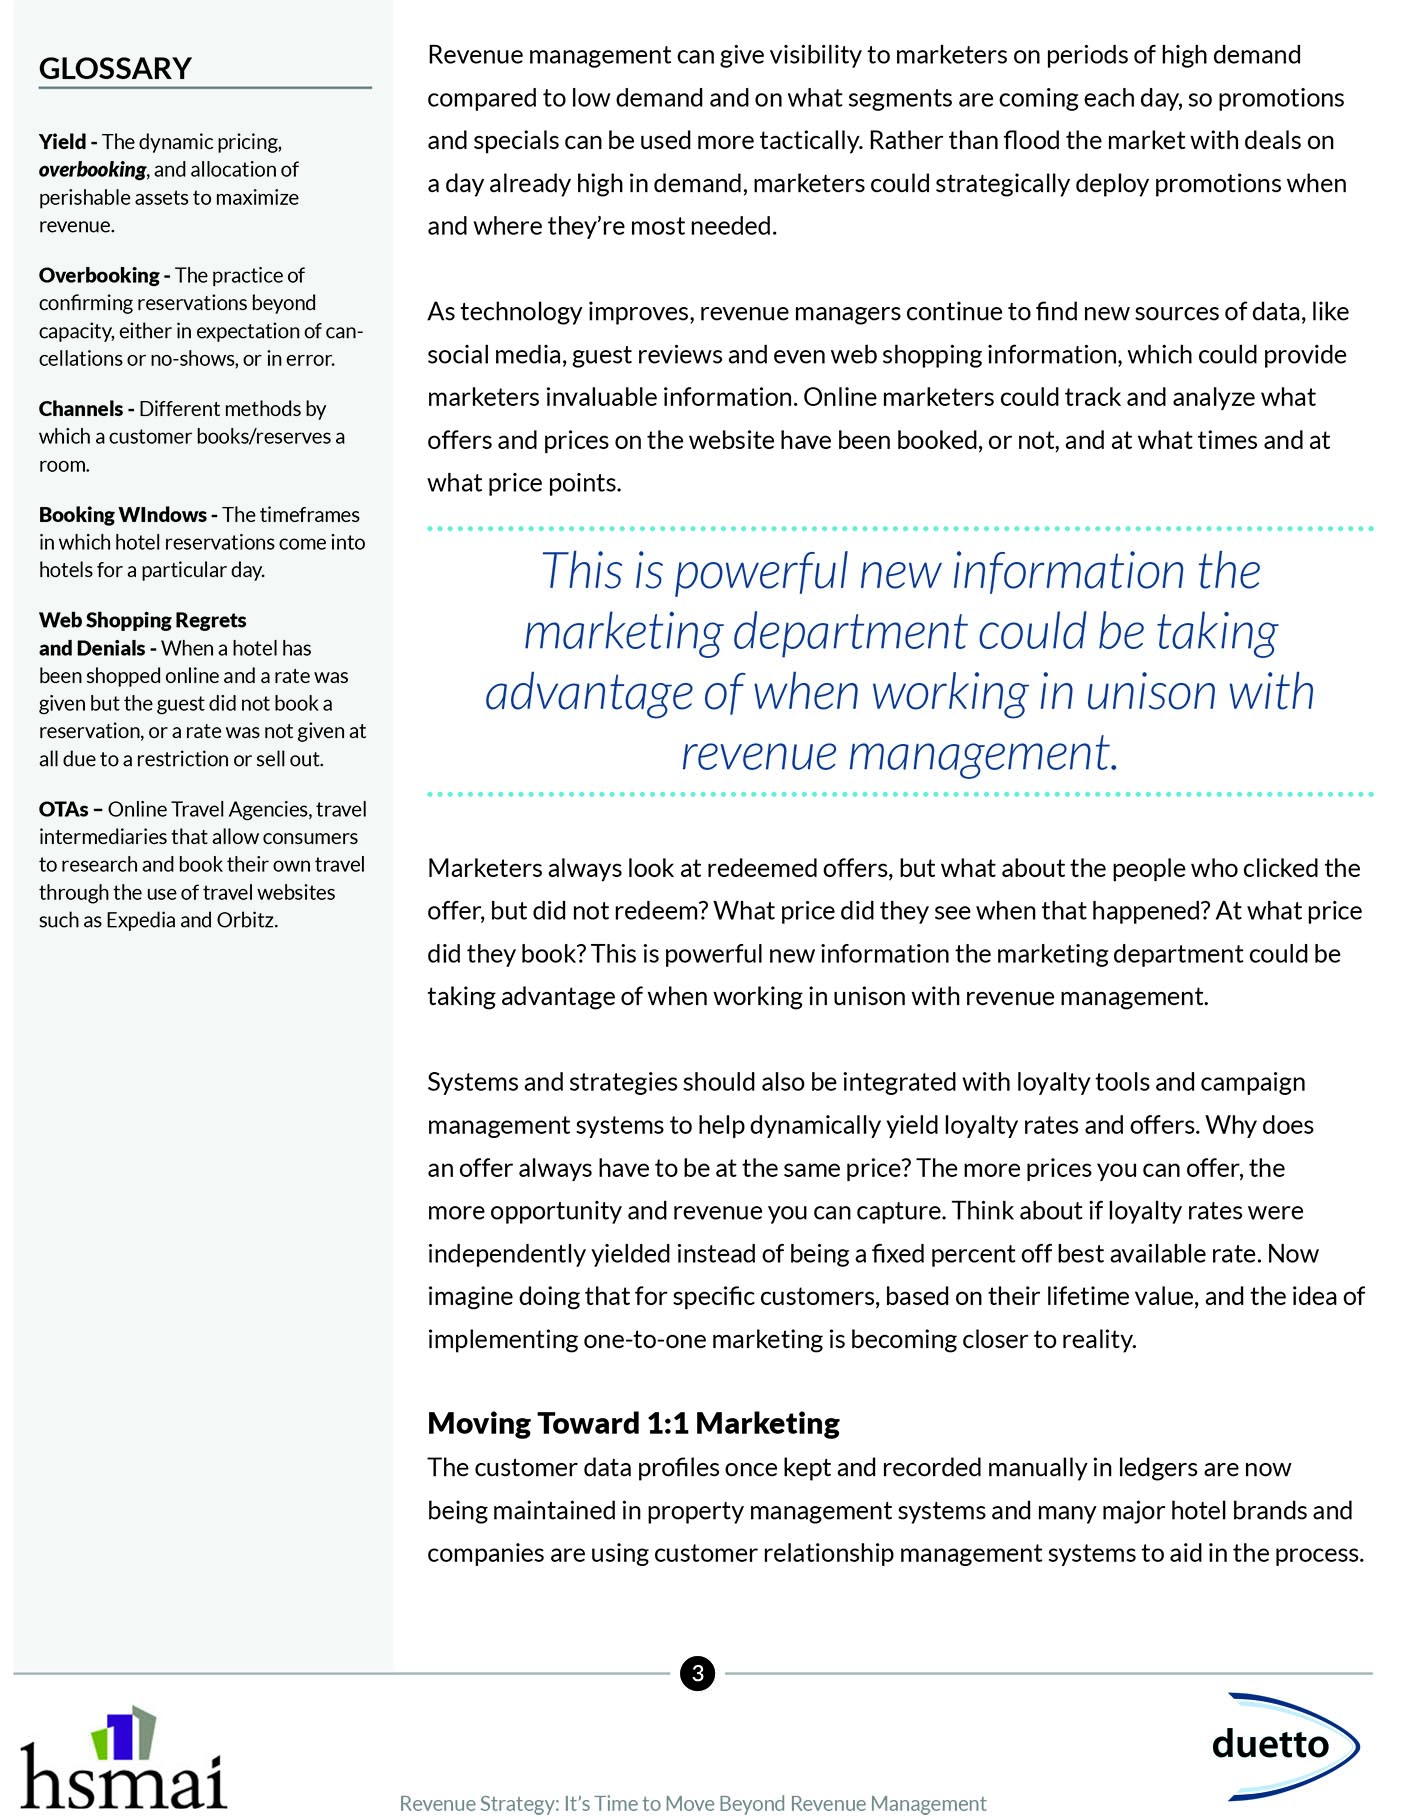 3 HSMAI - Bridging-the-Gap-Revenue-Management-Marketing-3.jpg